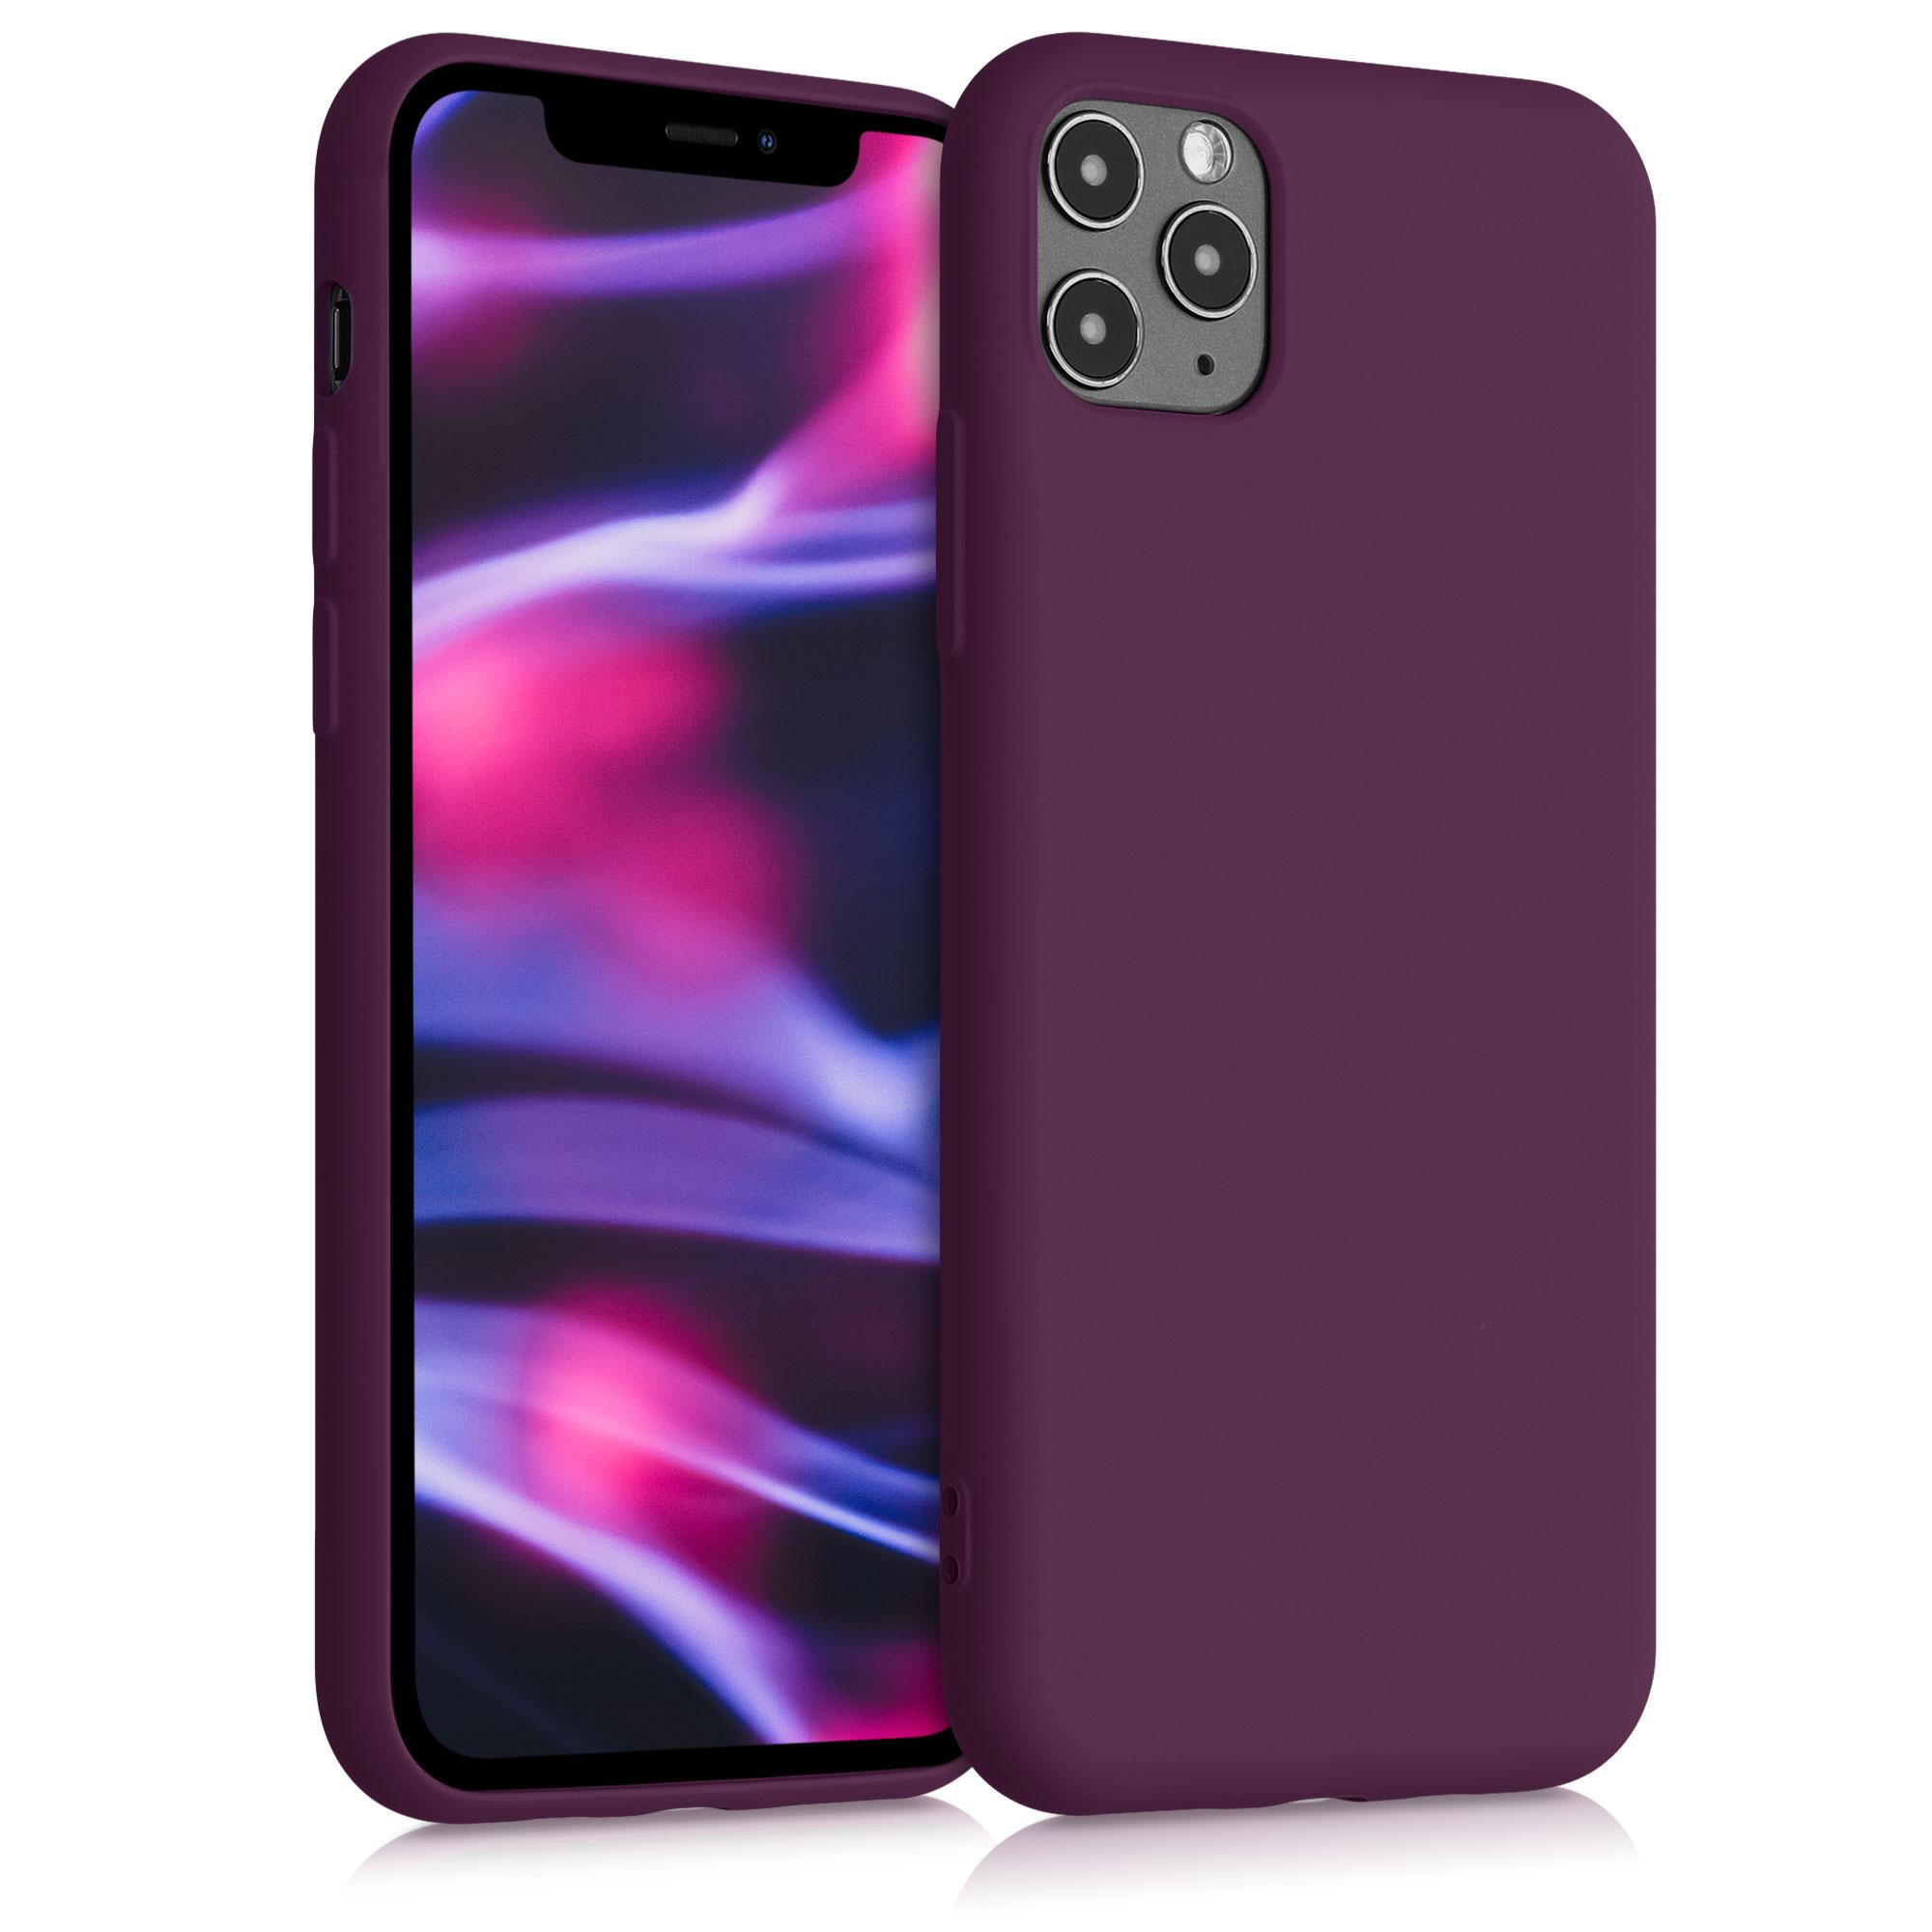 Kvalitní silikonové TPU pouzdro pro Apple iPhone 11 Pro Max - Bordeaux Violet